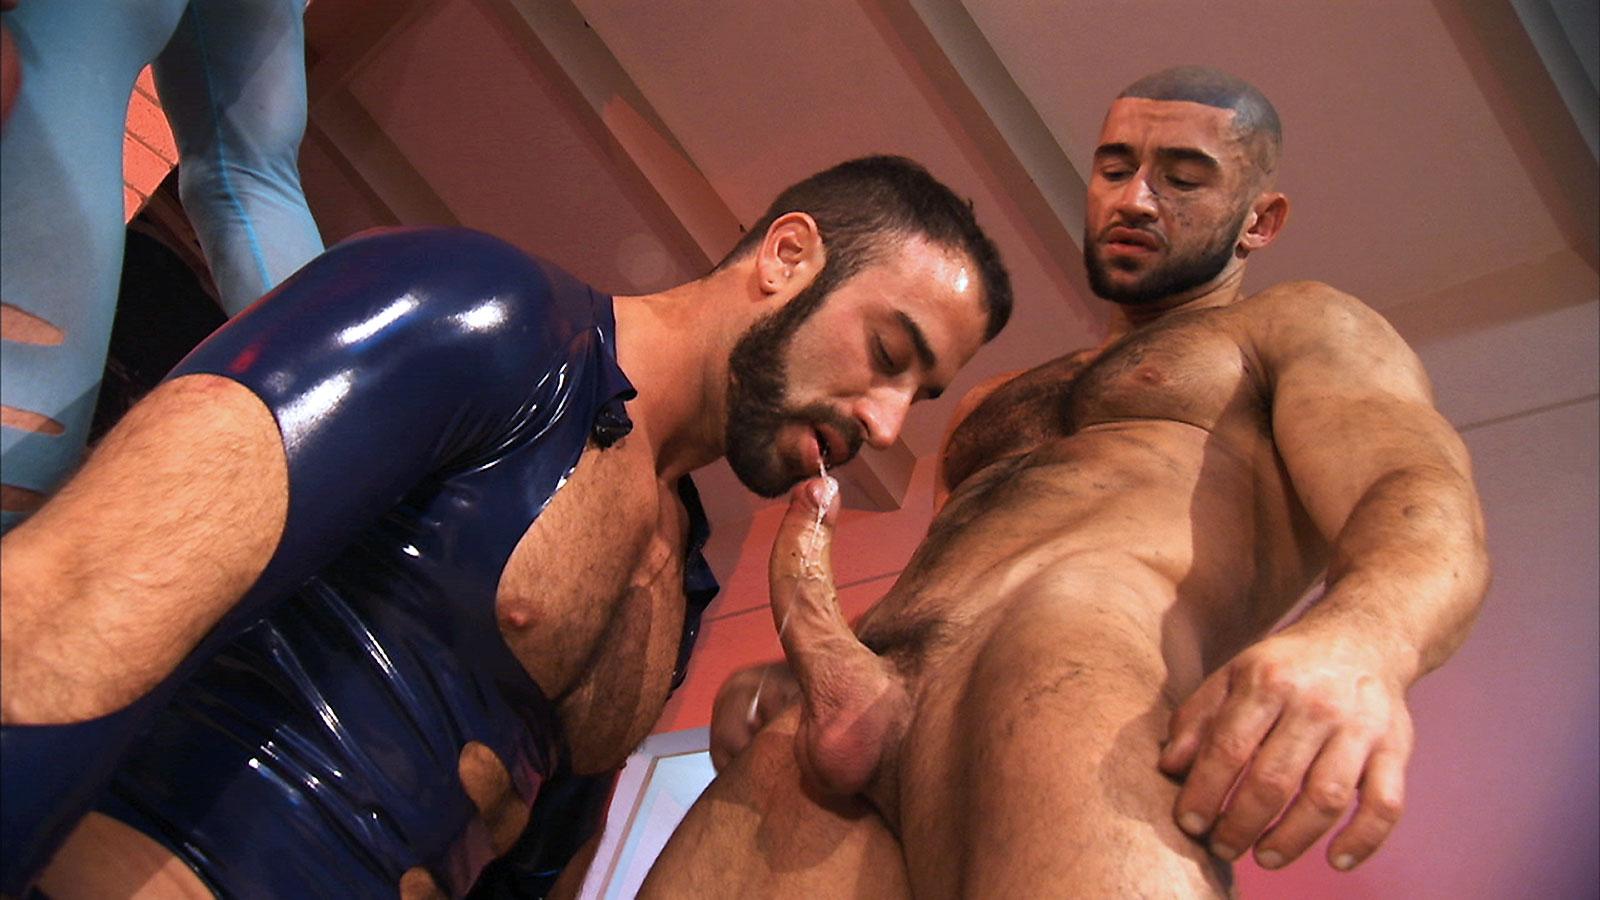 Incubus porno erotic clips